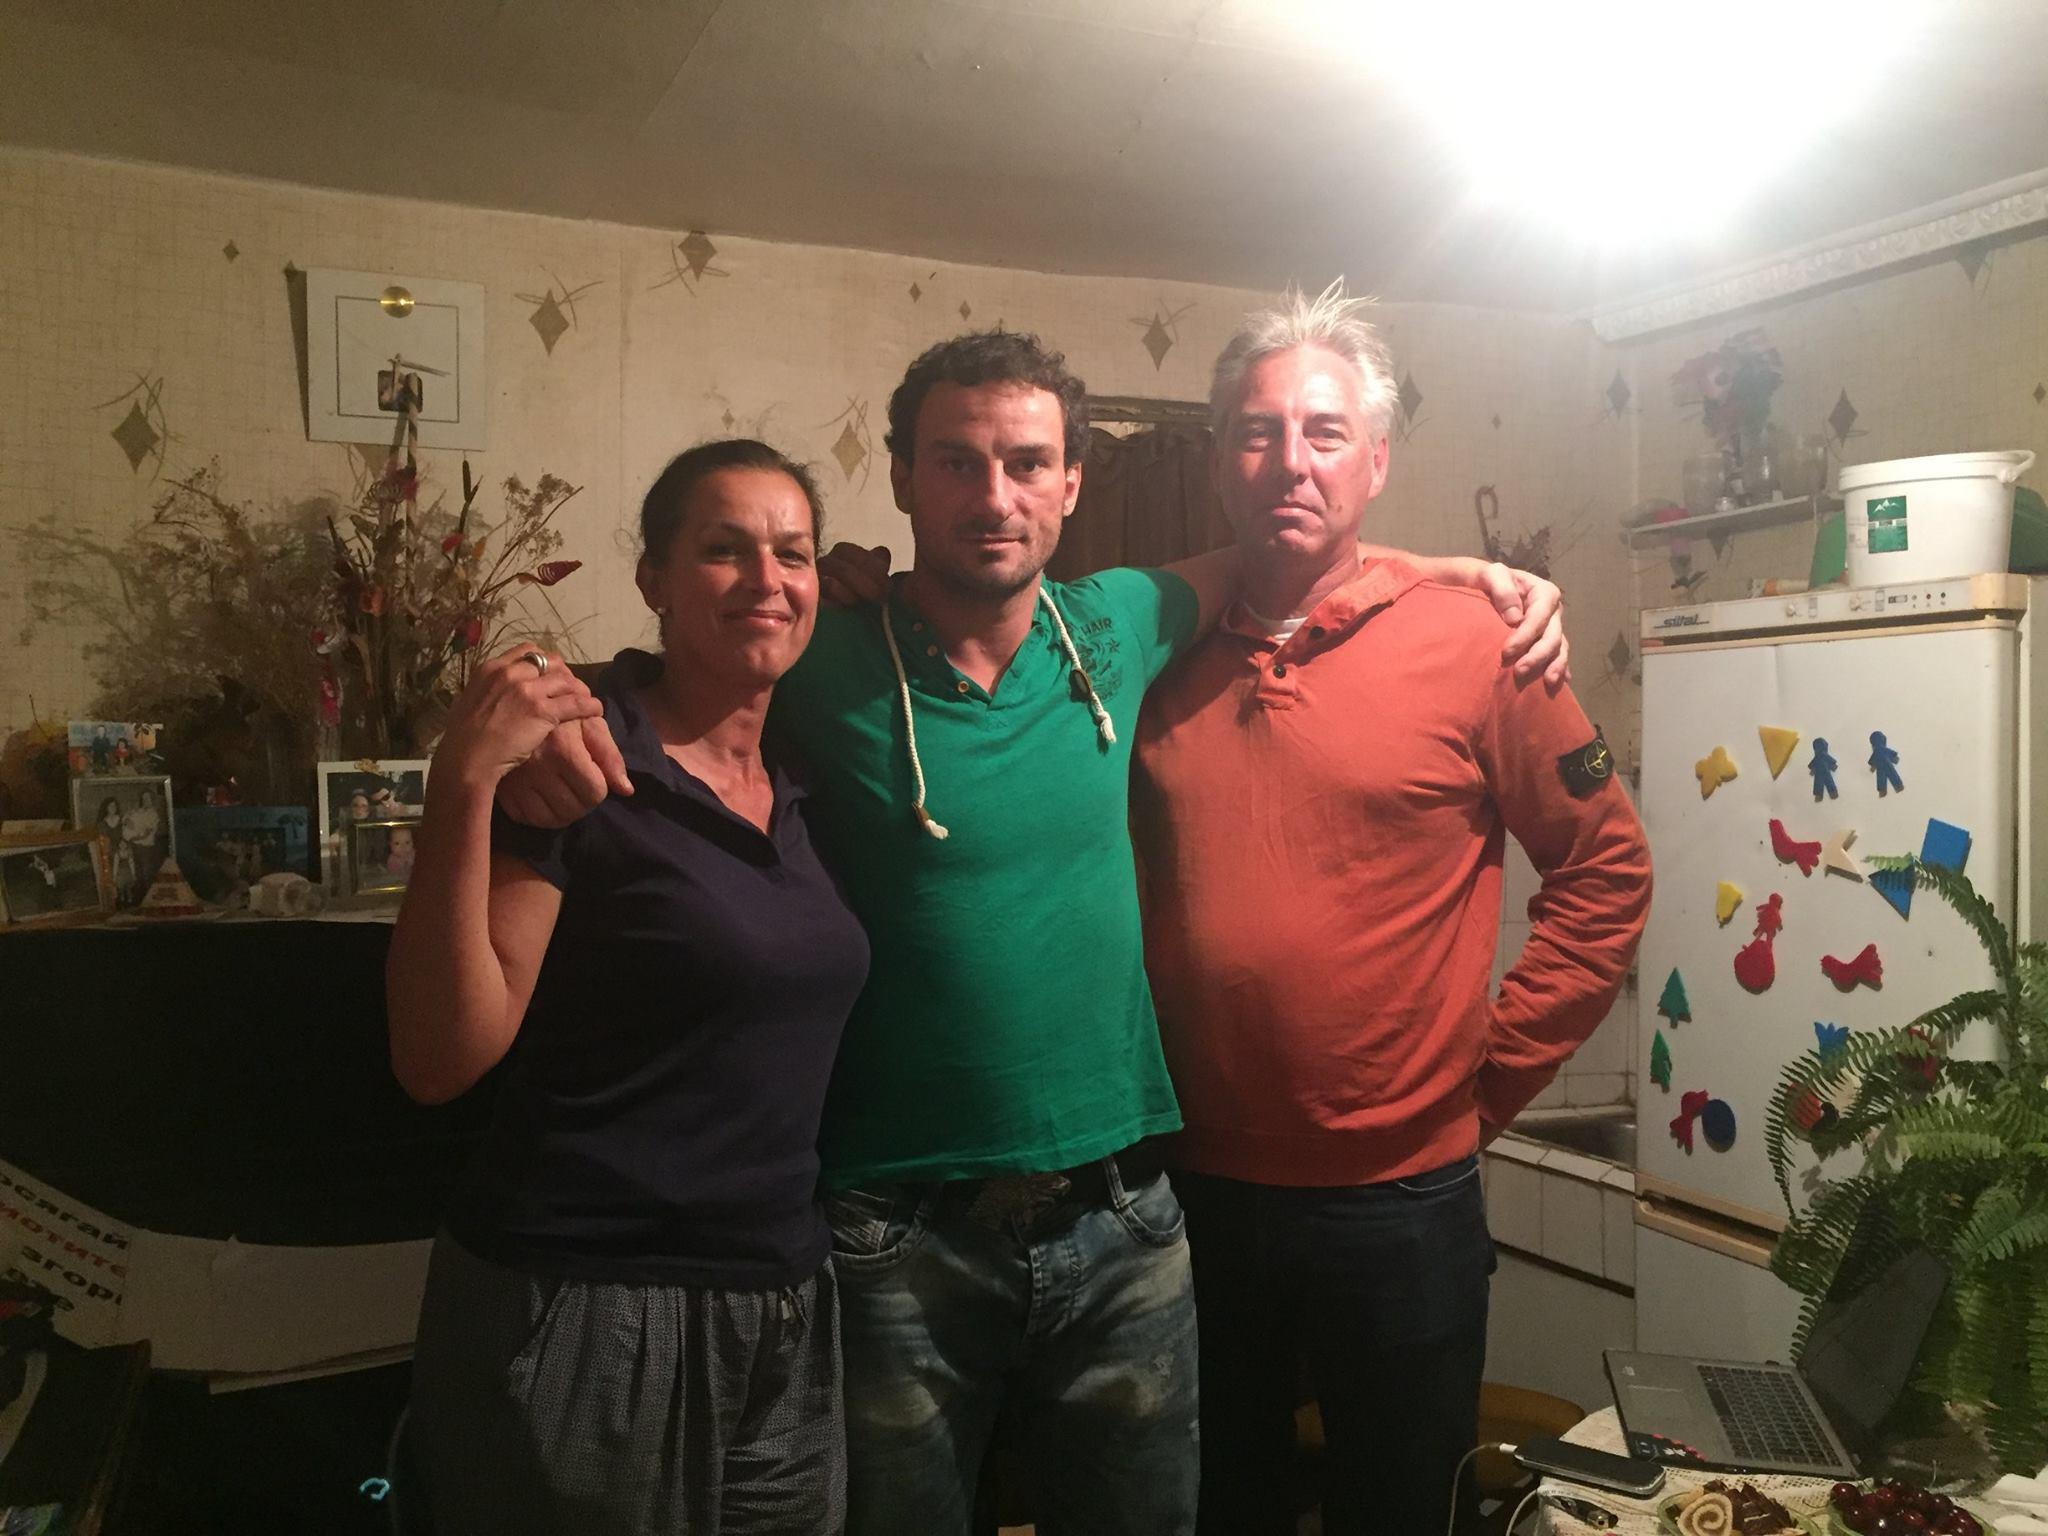 Edwin and Tatjana FB image